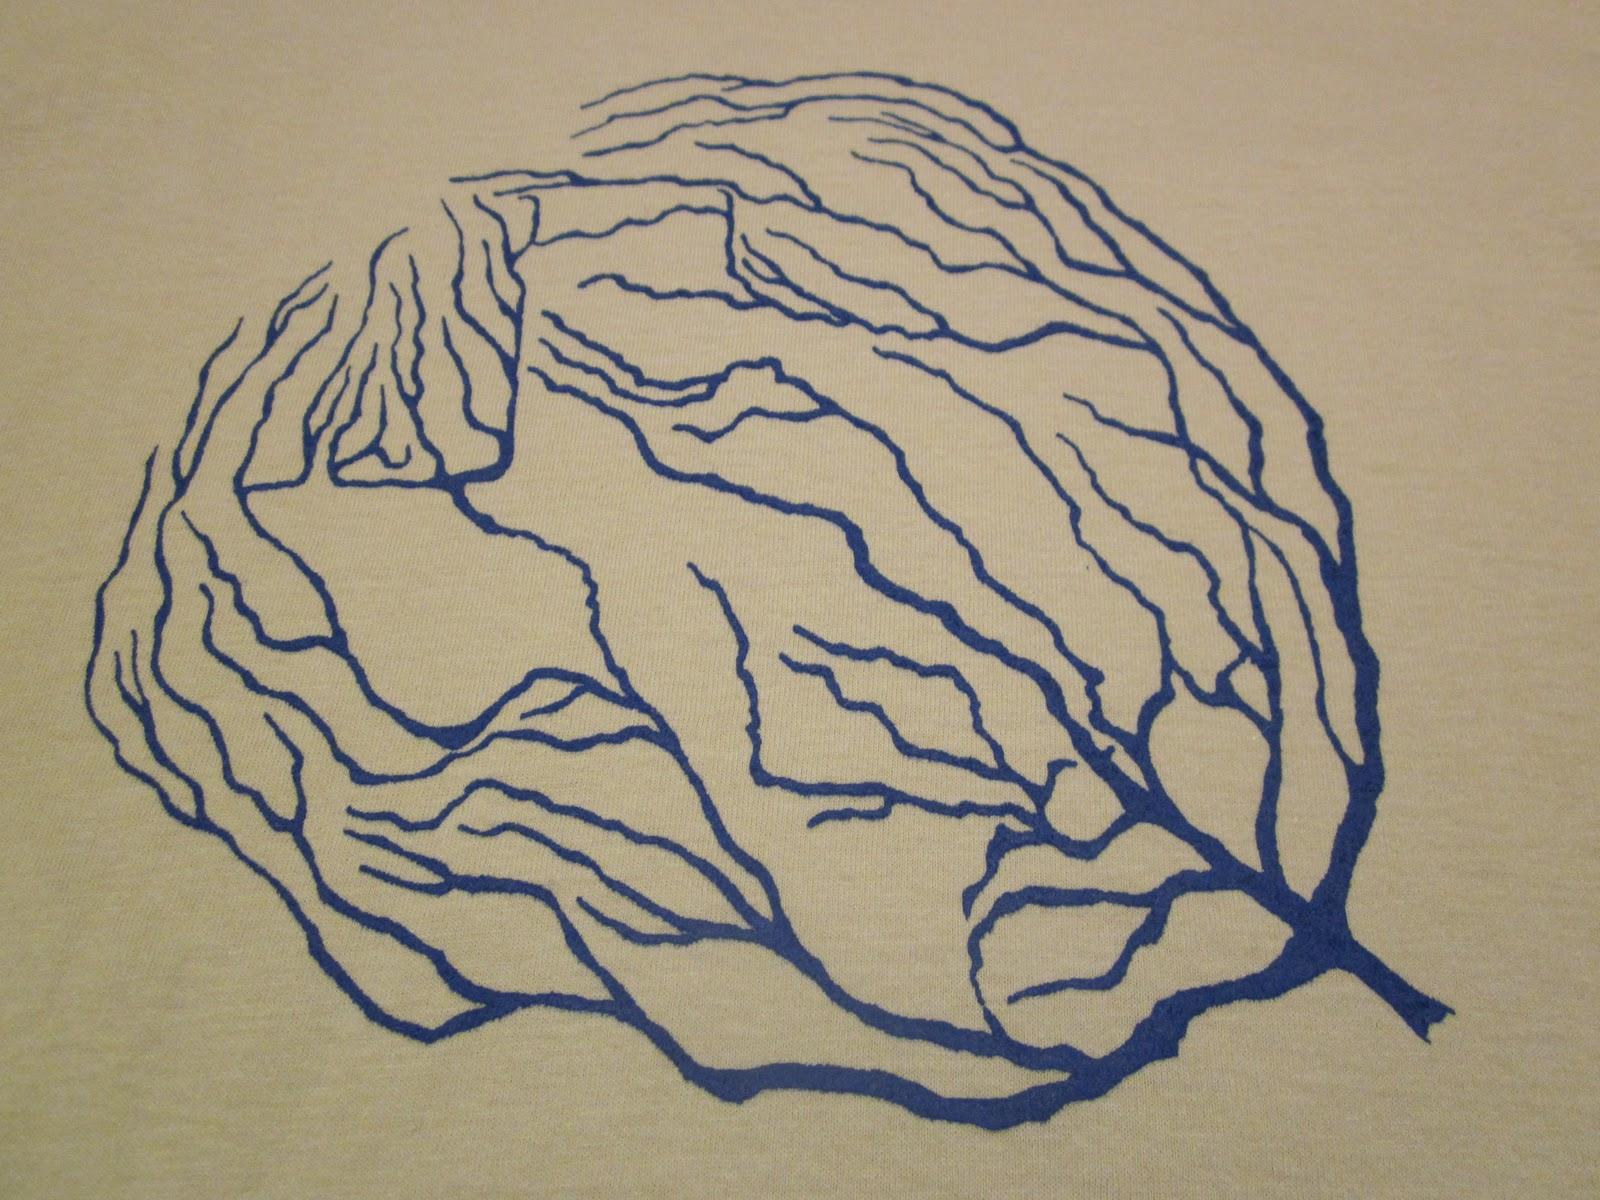 1600x1200 Texas Rivers Tumbleweed T Shirt Design